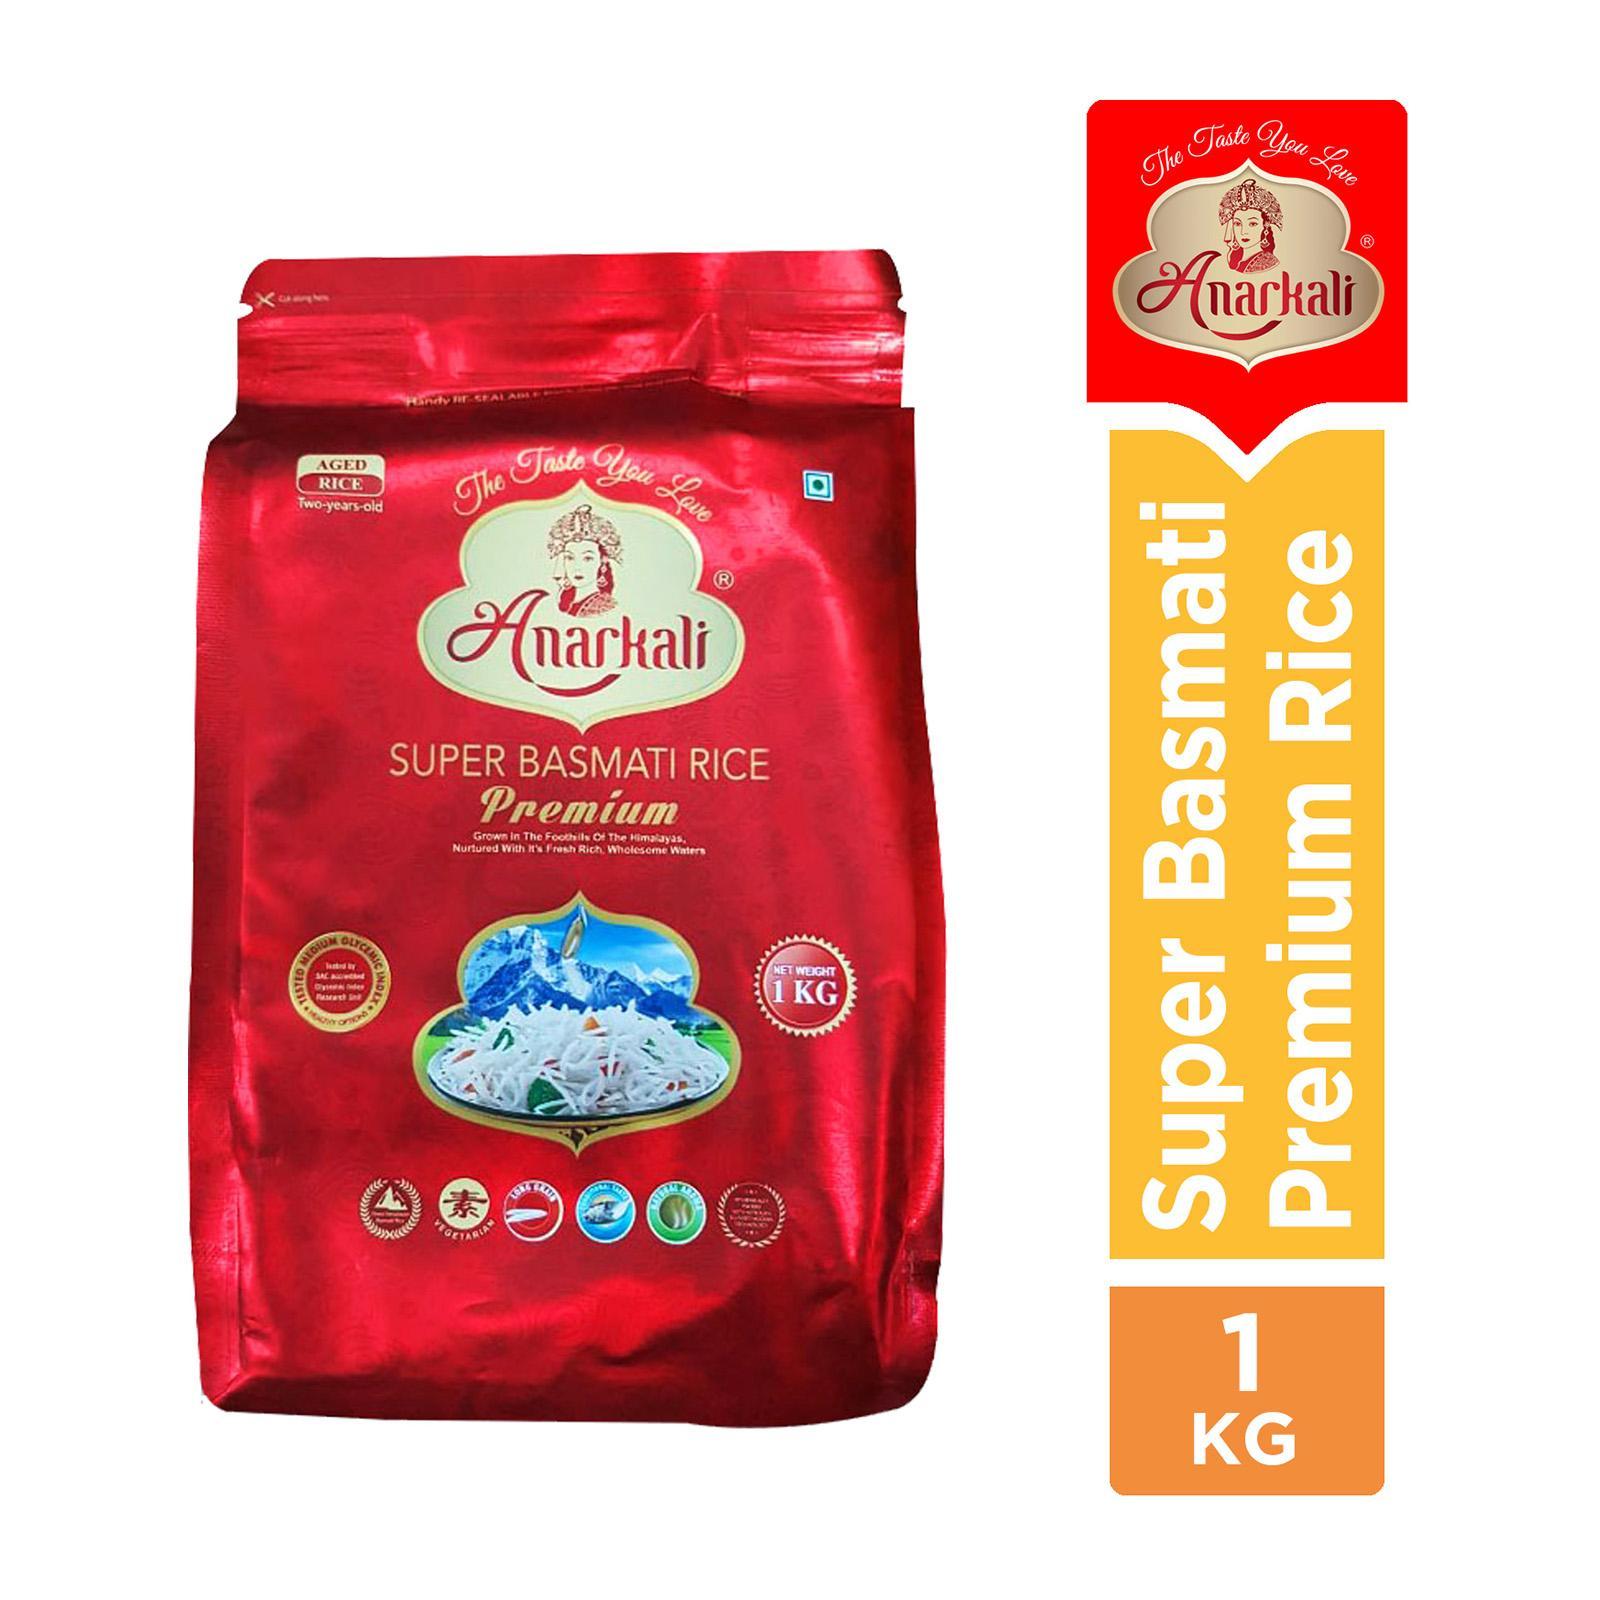 Anarkali Super Basmati Premium Rice 1 Kg Pakistan